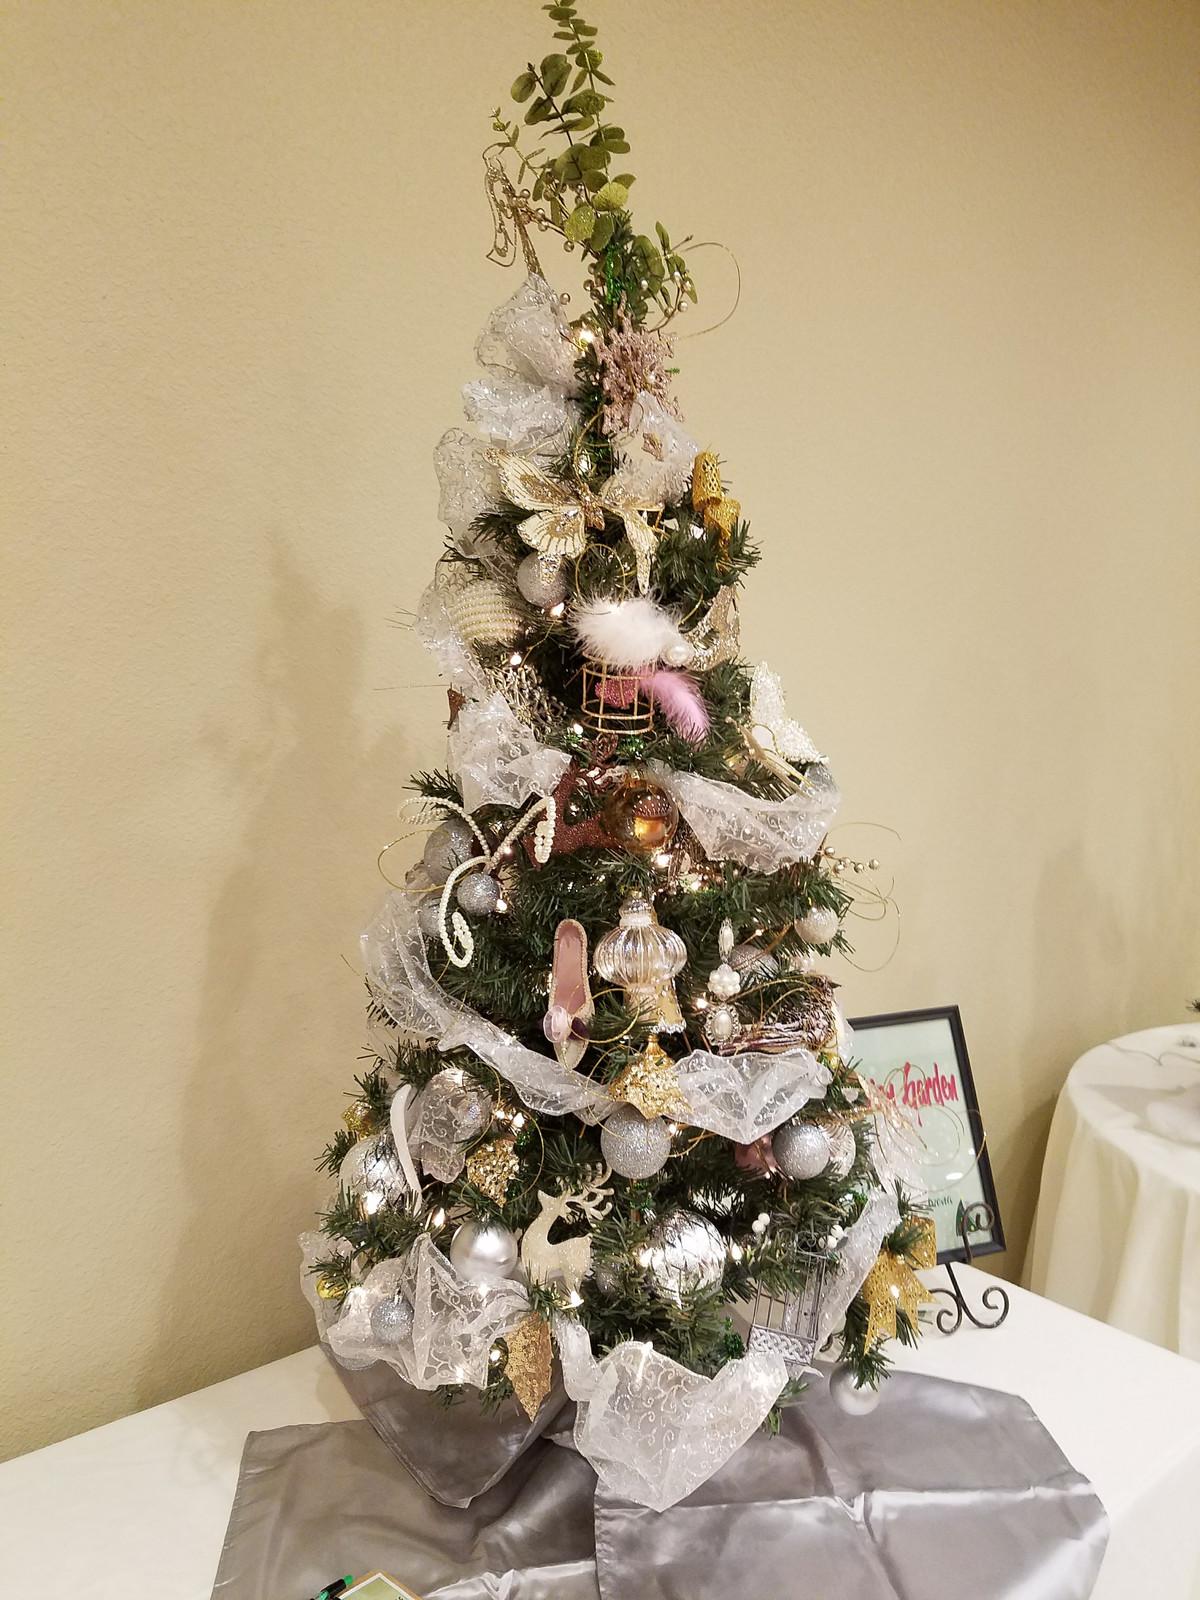 Interfaith Outreach Services | OH! CHRISTMAS TREE